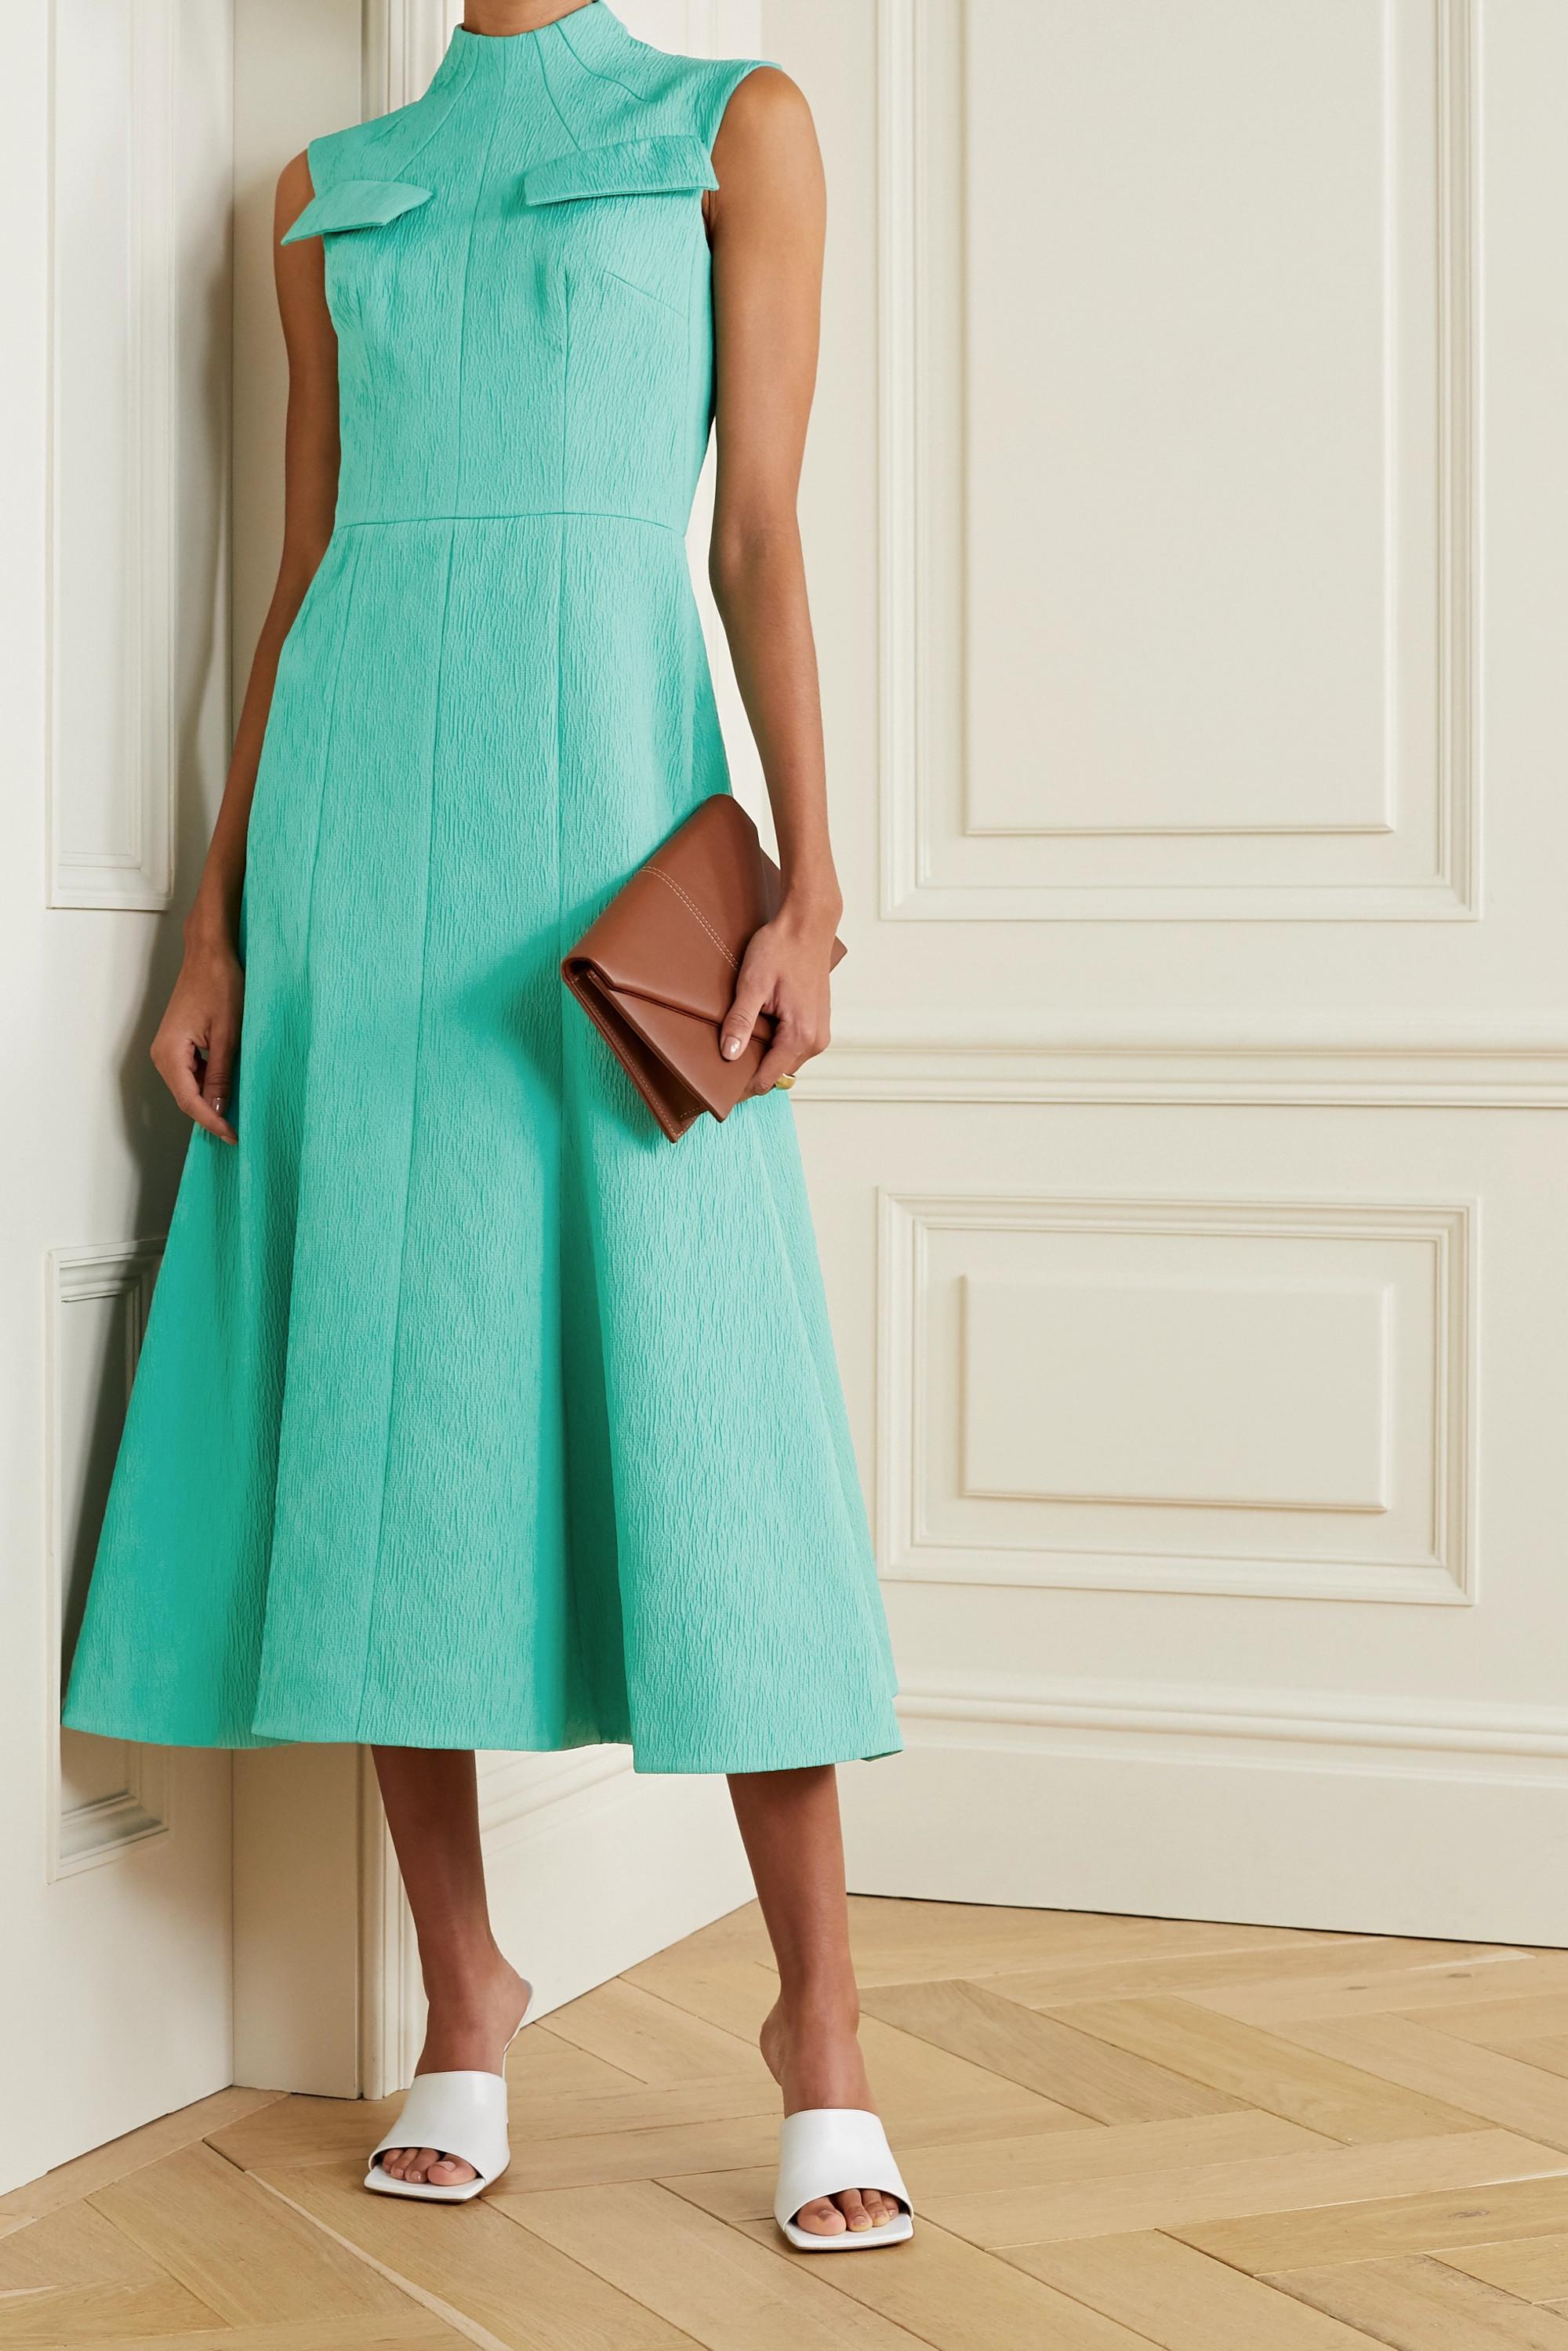 Emilia Wickstead Iago cutout pleated cloqué maxi dress